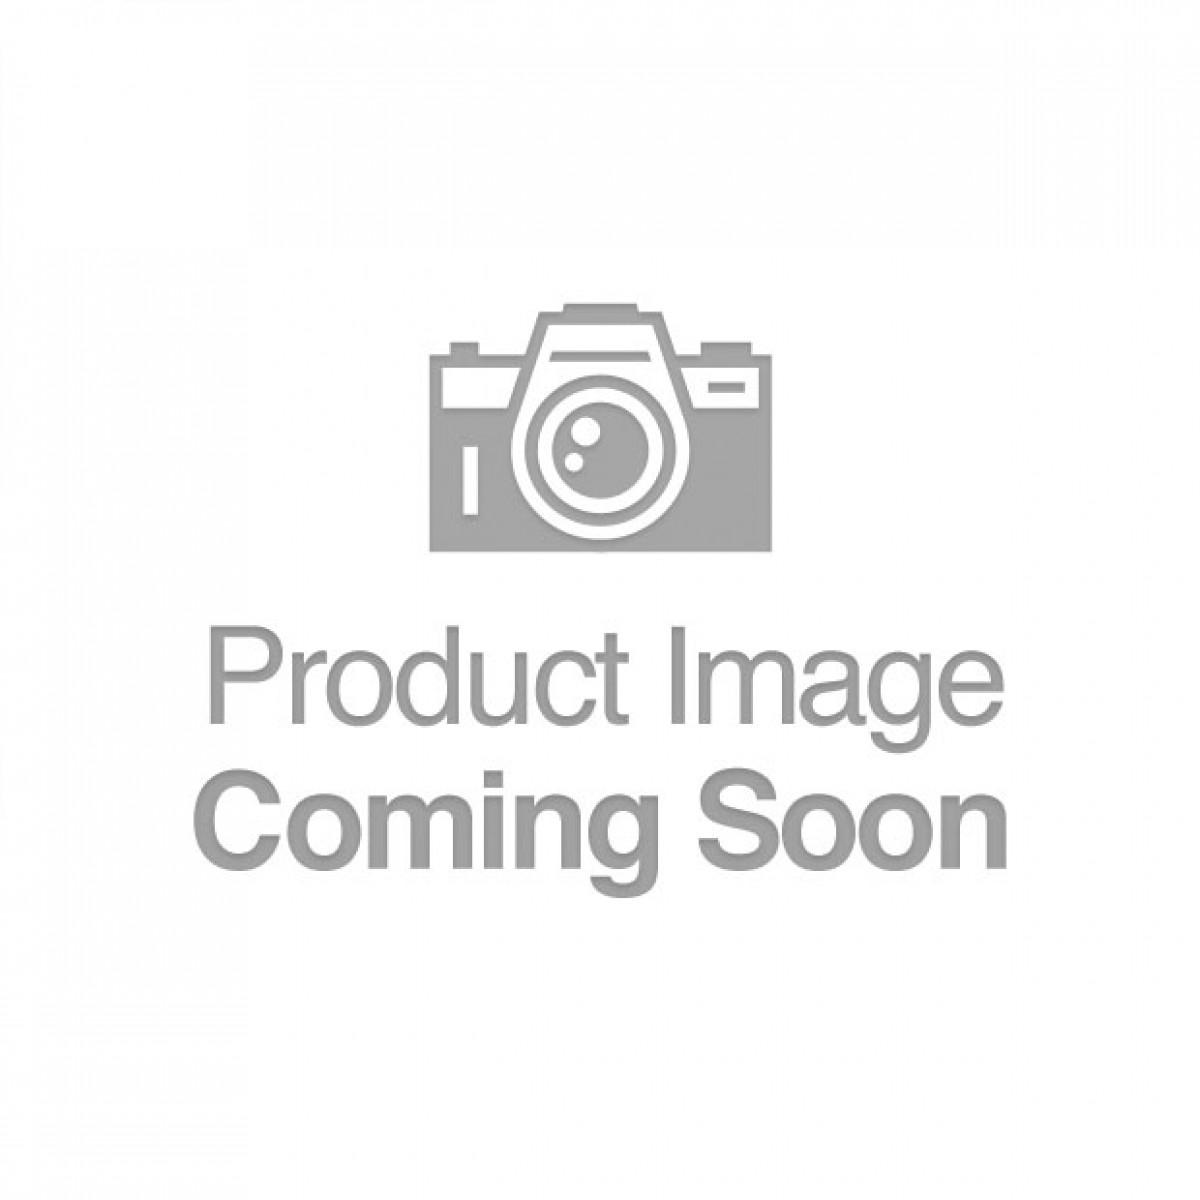 Master Series Dark Inflator Inflatable Silicone Anal Plug - Black